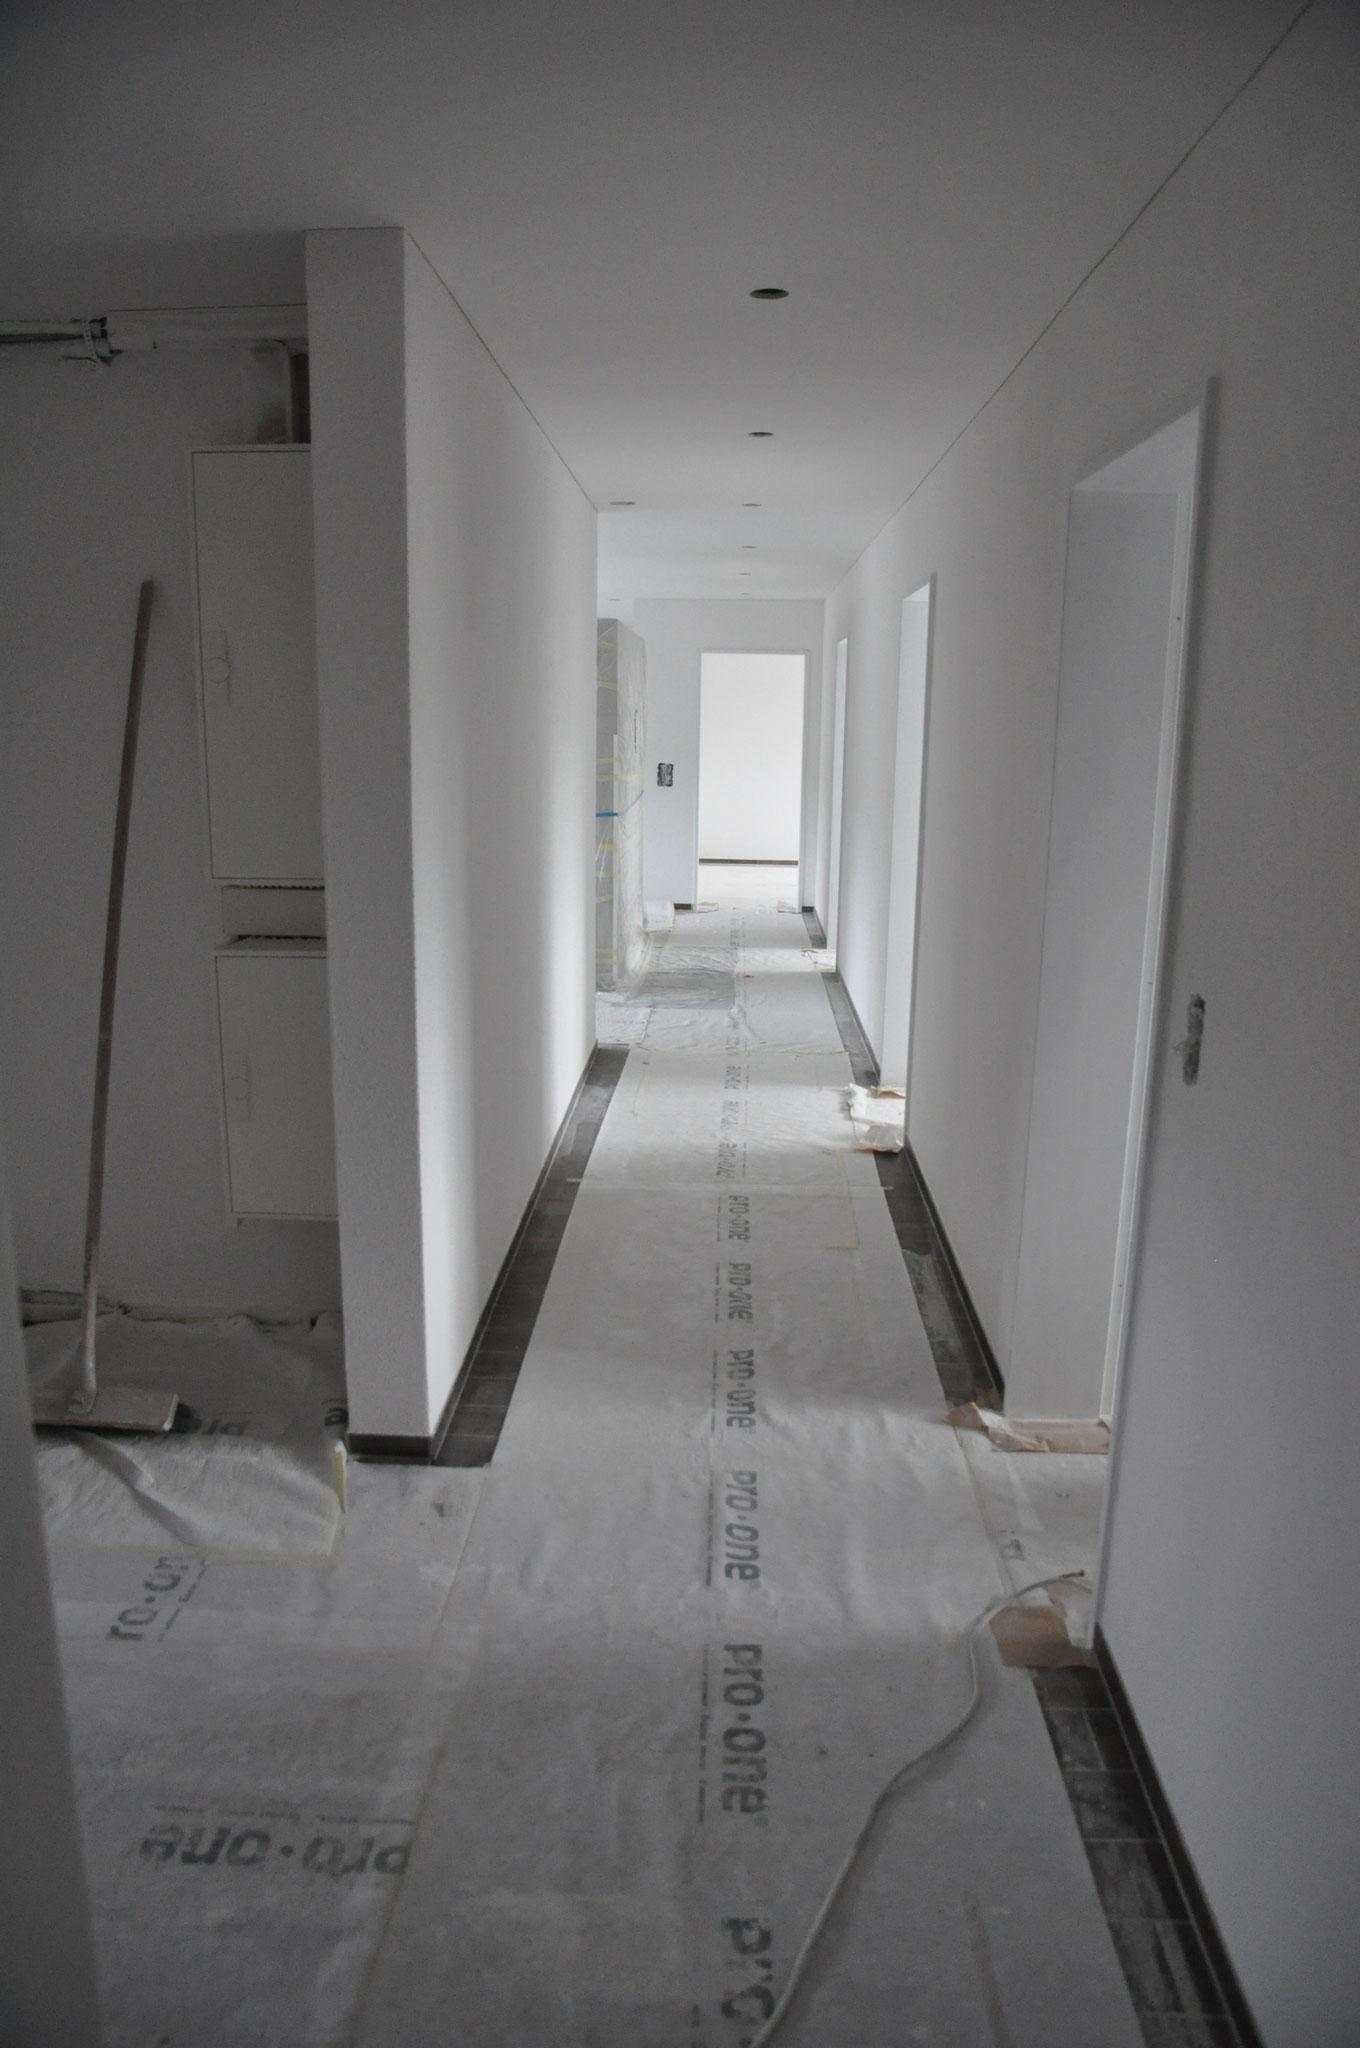 Innenausbau Gang 4,5 Zimmer Wohnung Einheit B (Mai 2016)